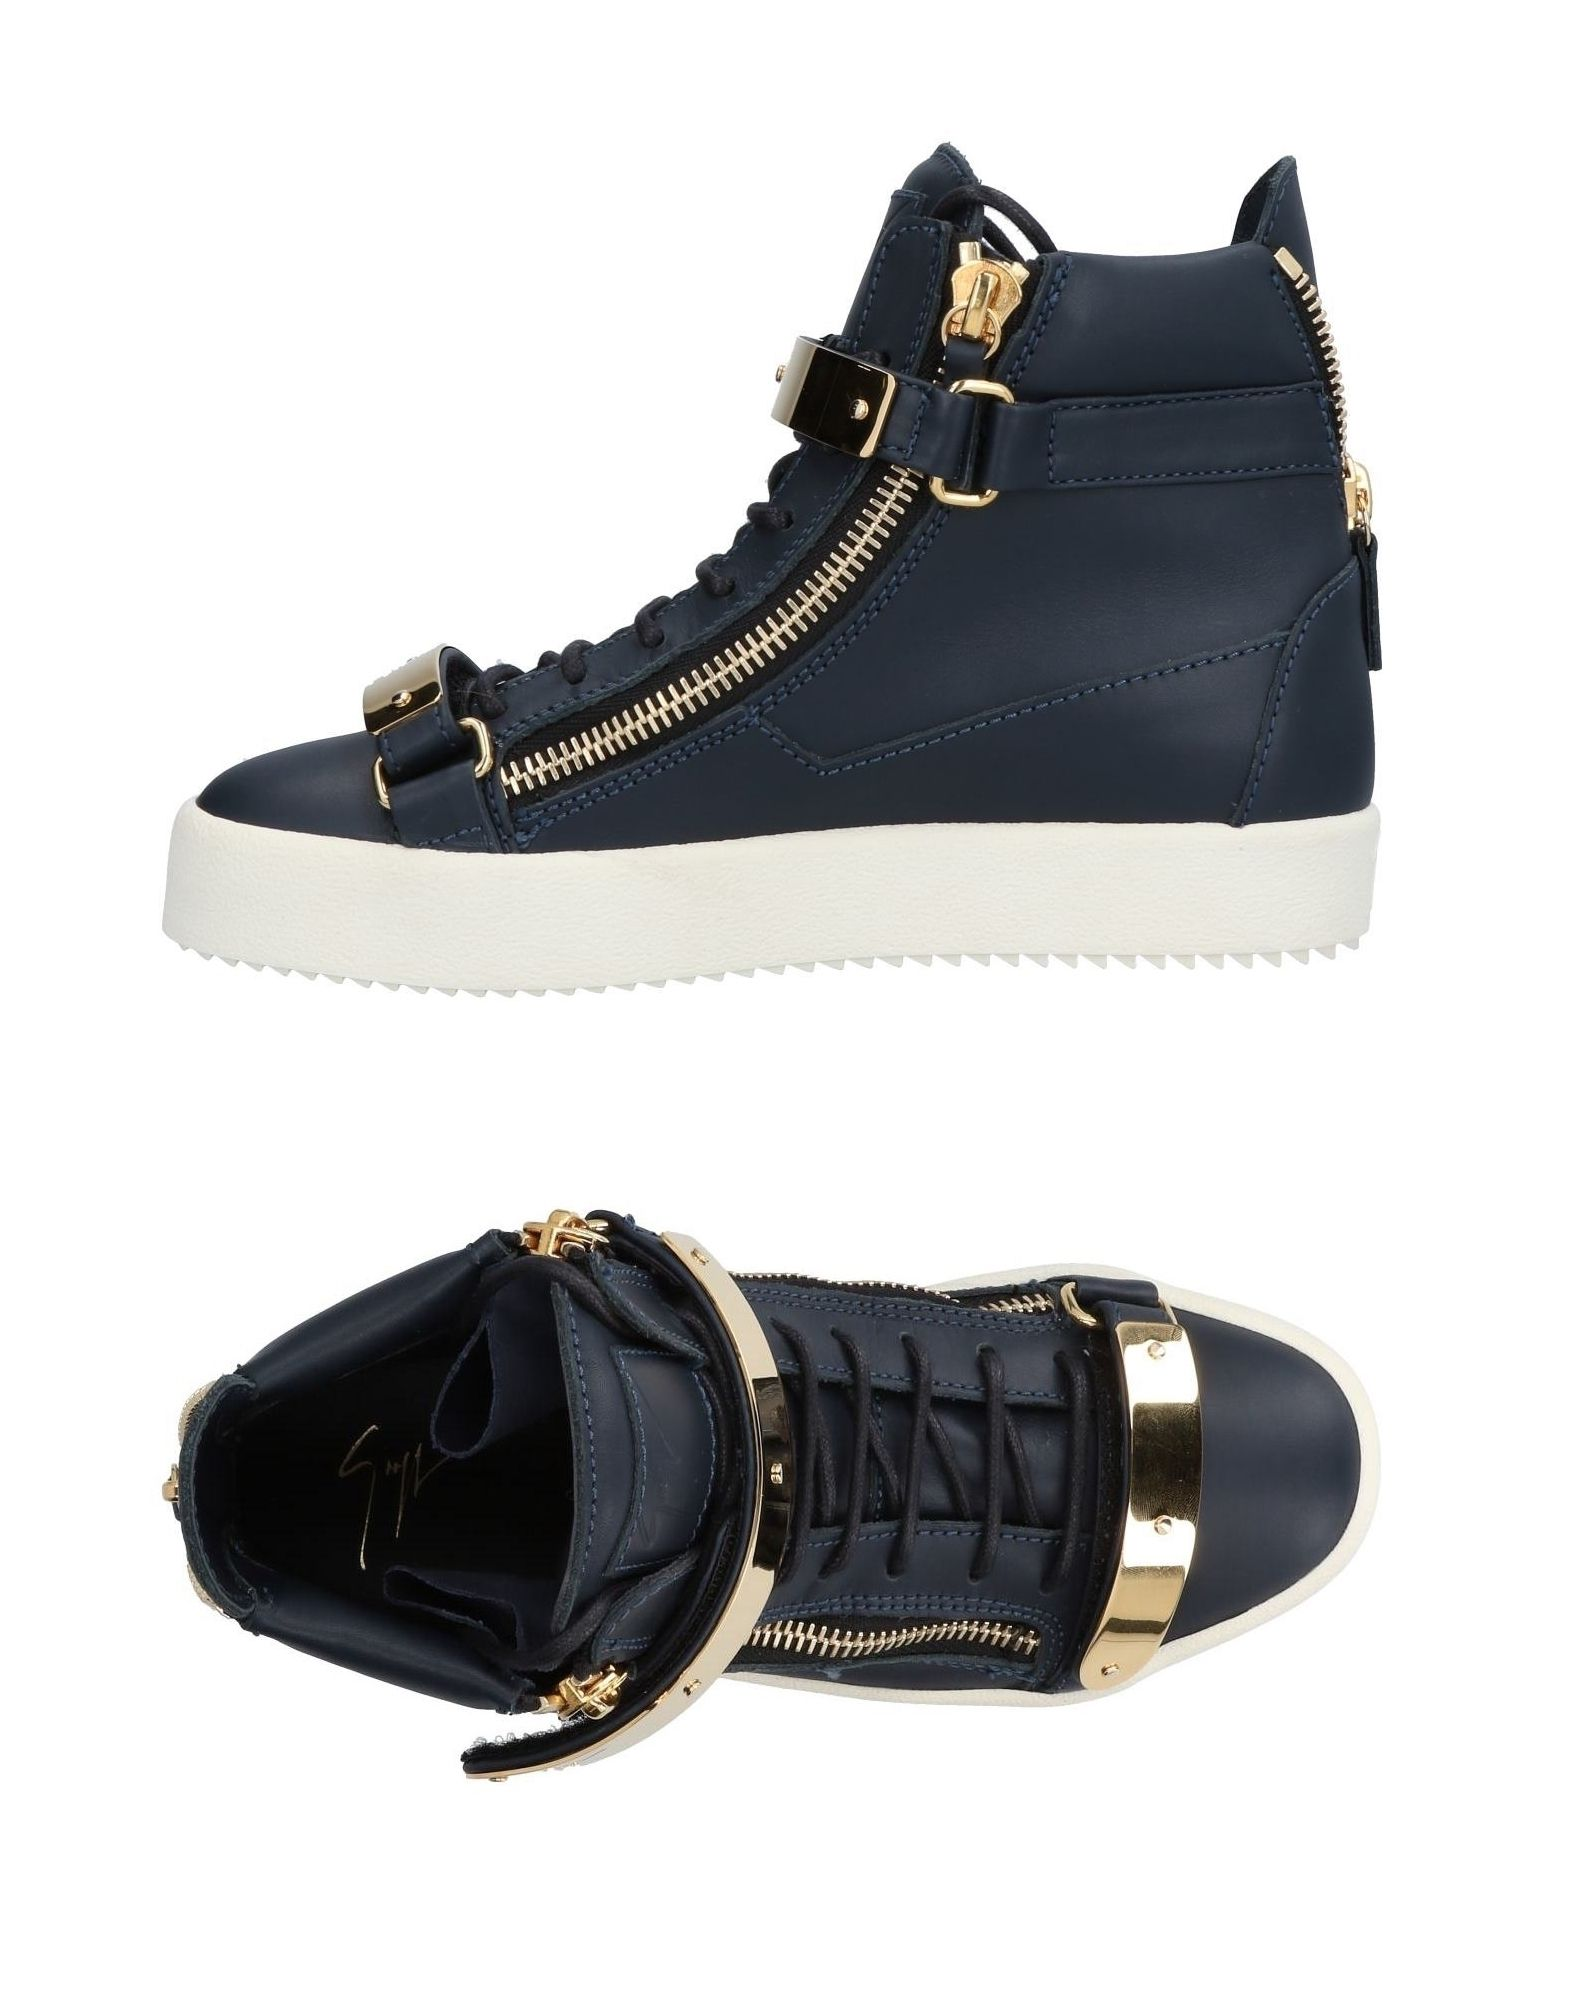 Giuseppe Zanotti Sneakers - Zanotti Women Giuseppe Zanotti - Sneakers online on  United Kingdom - 11038492CG 88fdf4